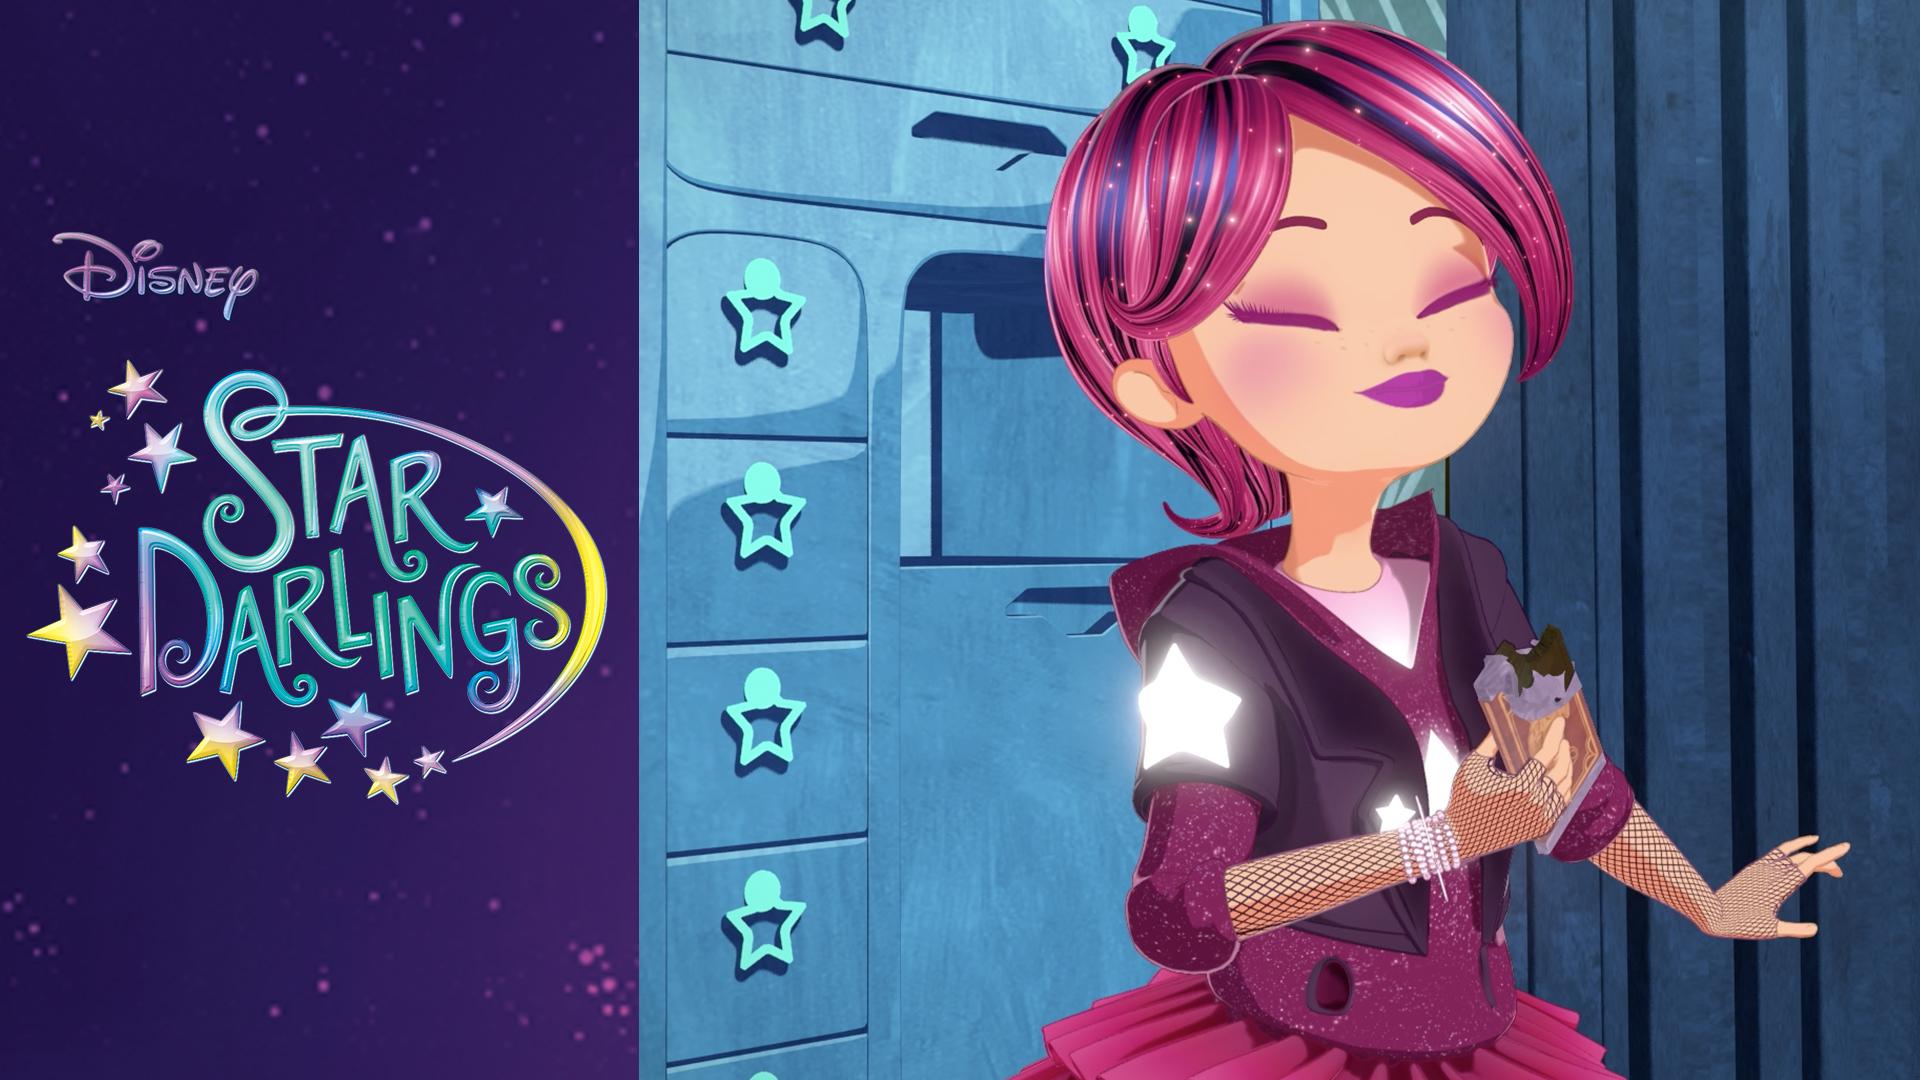 Choc It Up - Disney's Star Darlings Clip